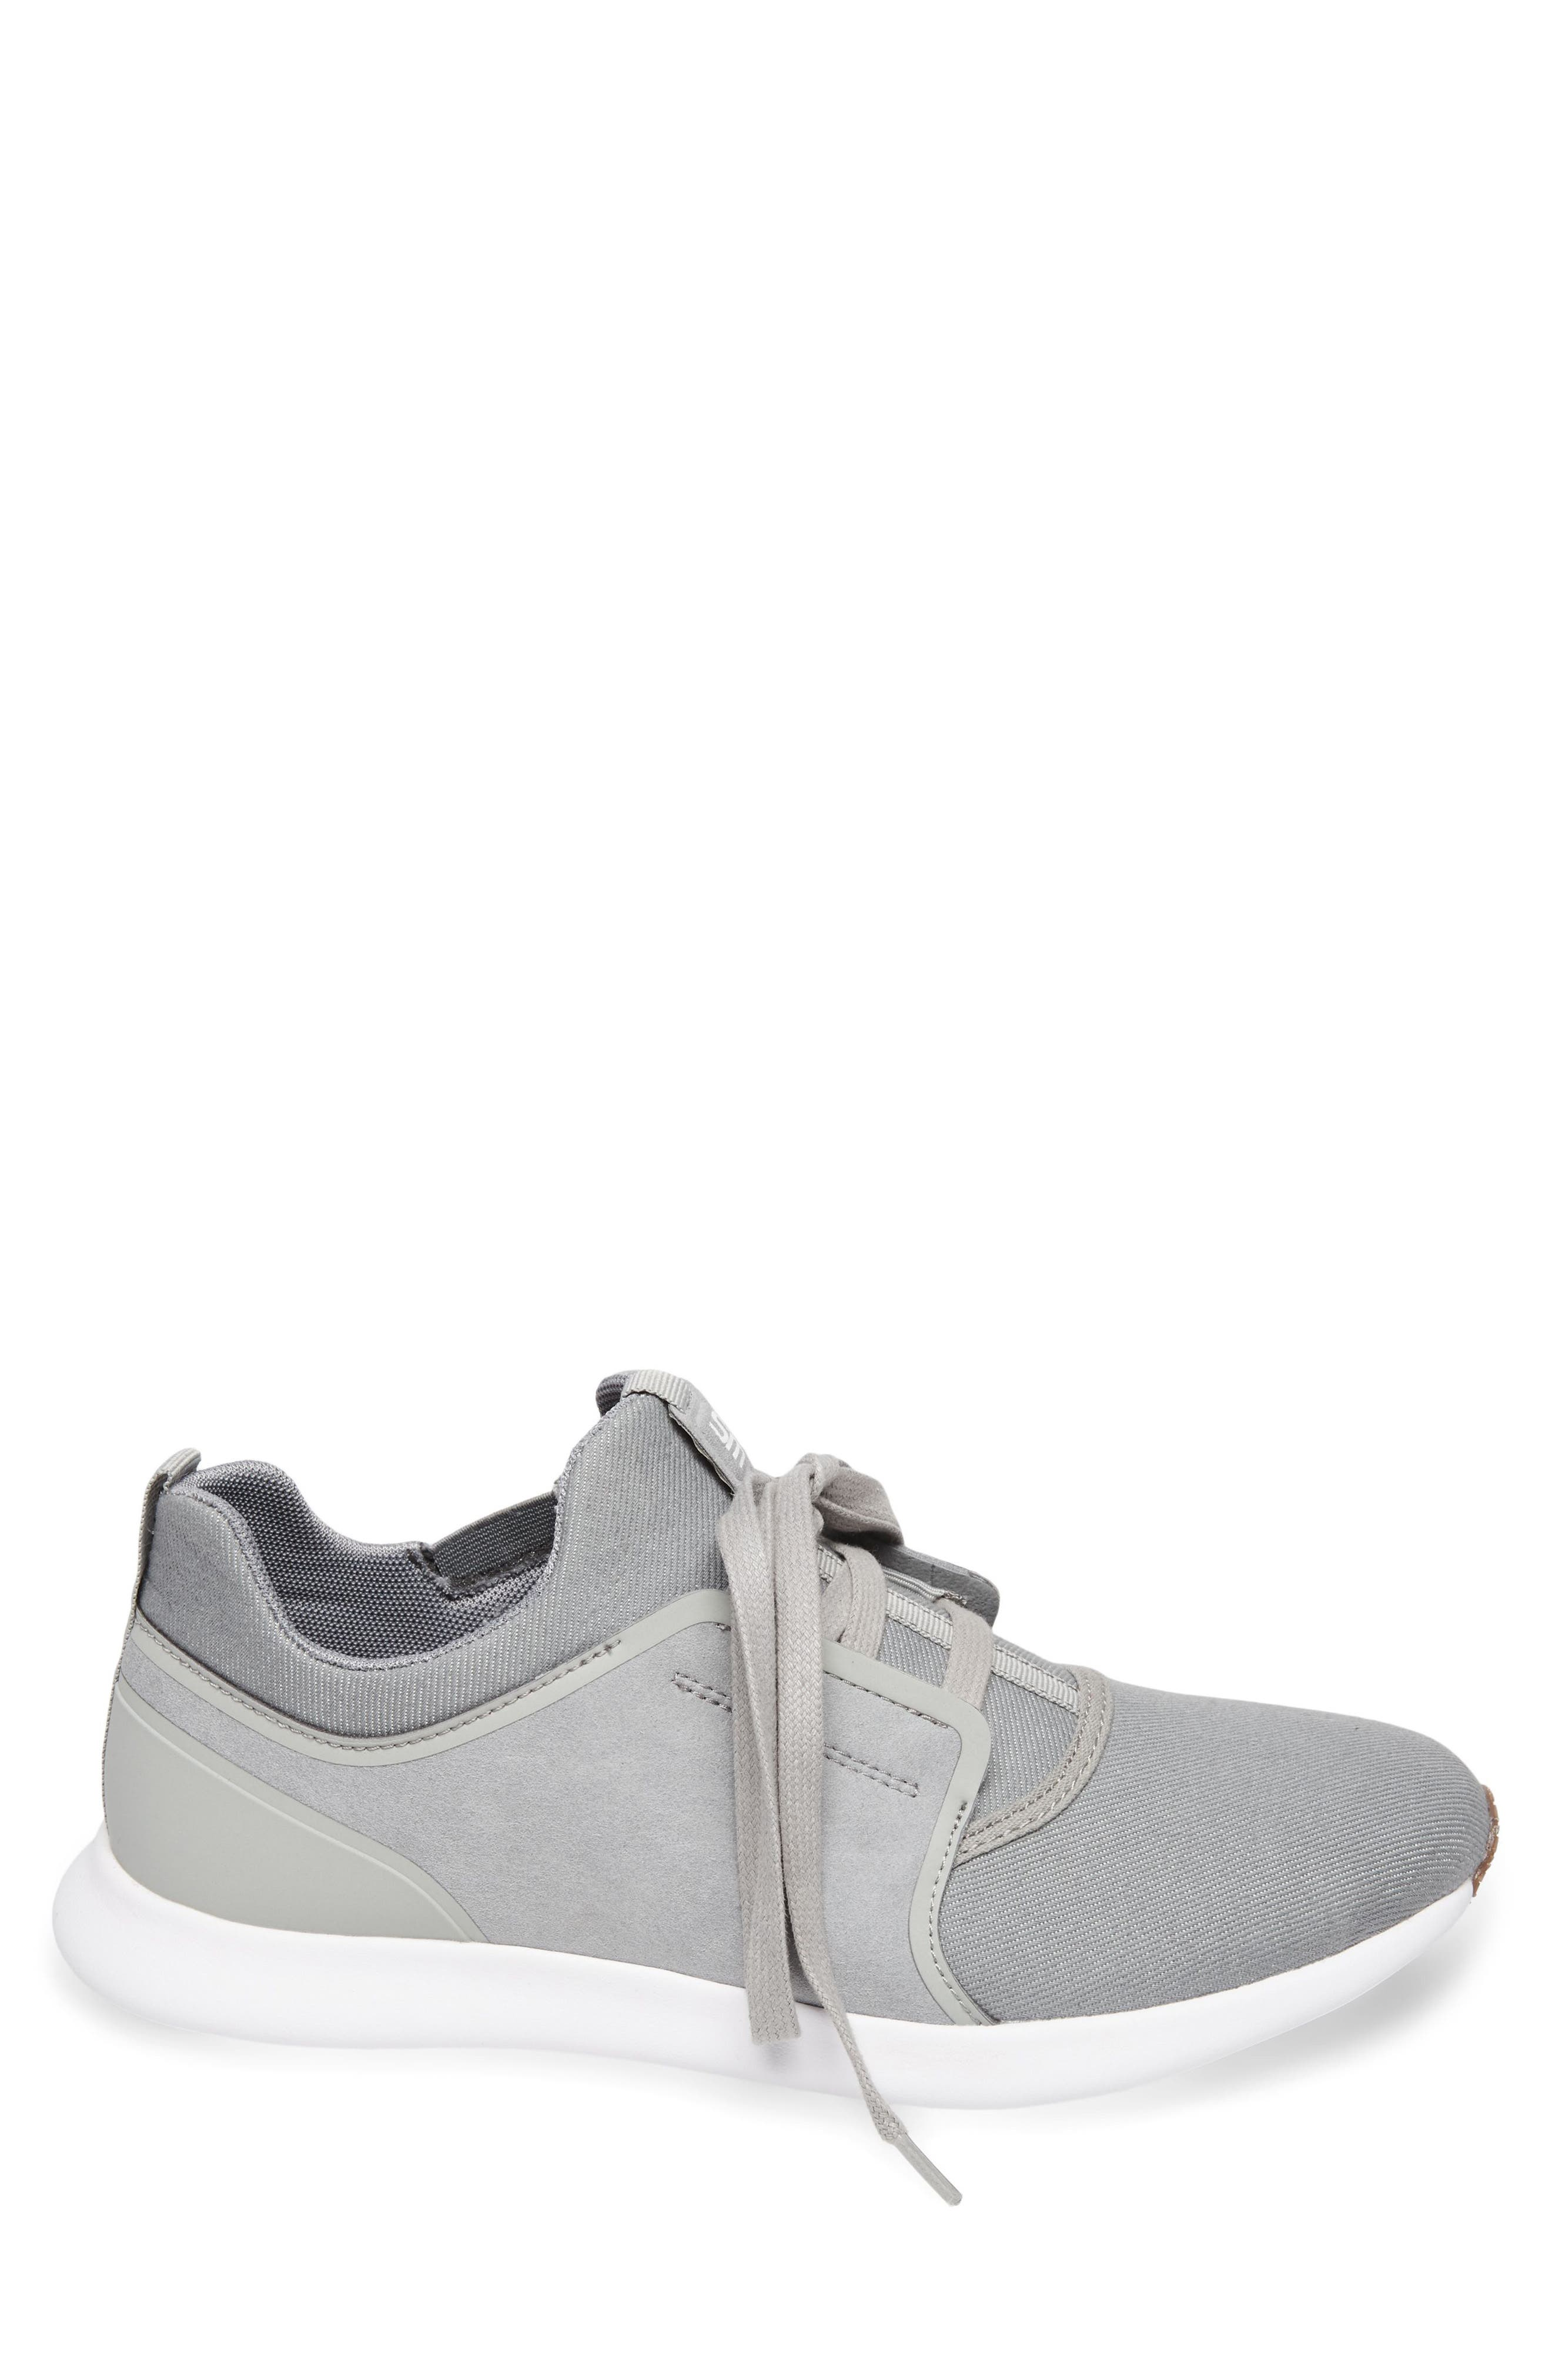 Barrett Sneaker,                             Alternate thumbnail 3, color,                             Grey Leather